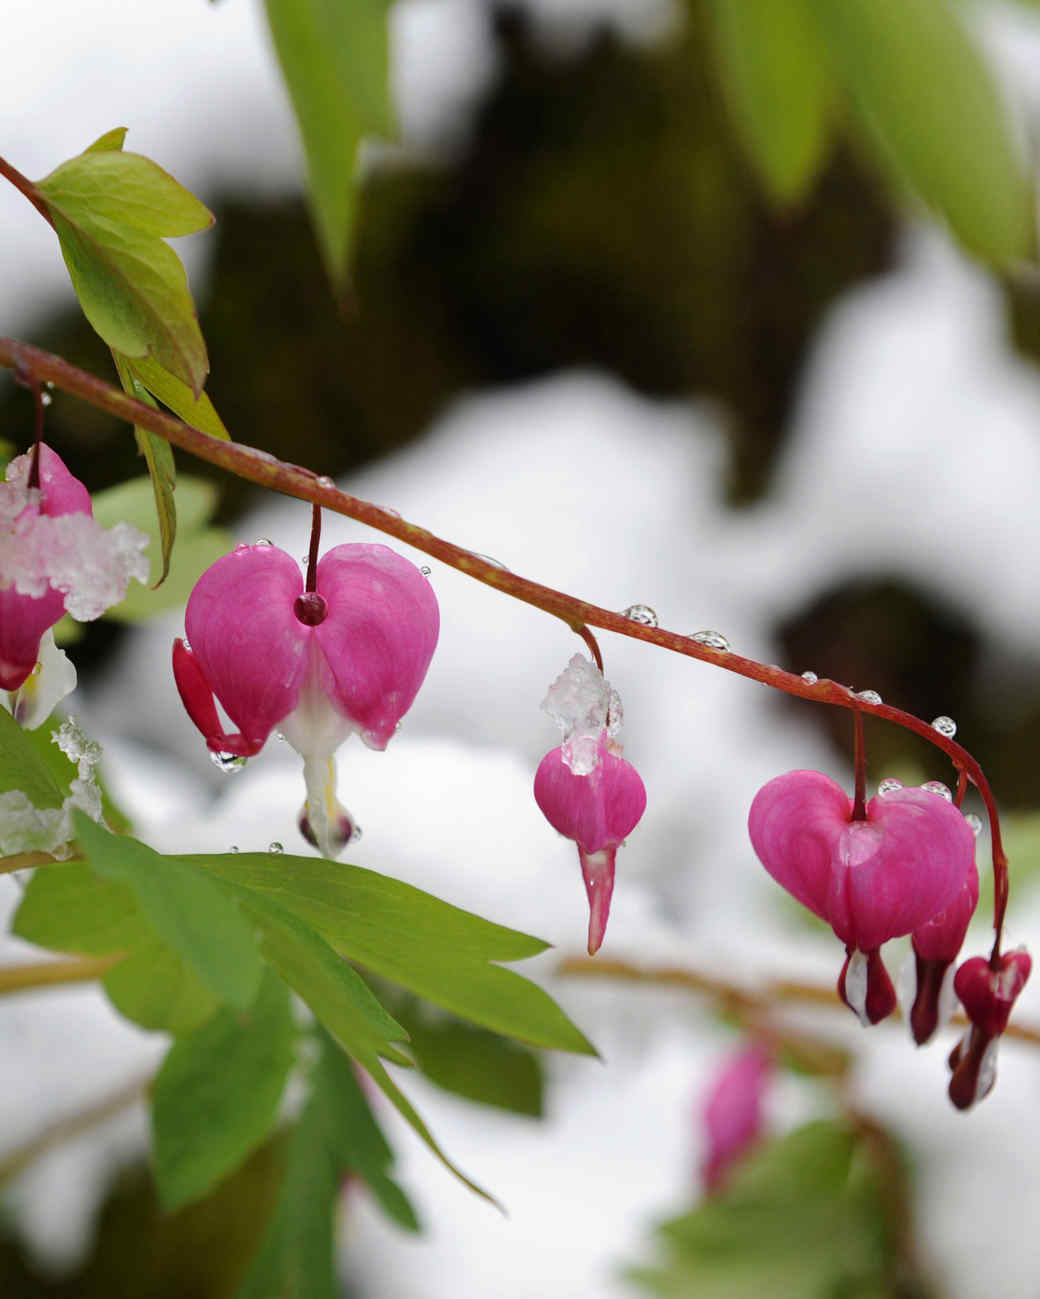 bleeding heart flowers covered in frosty ice